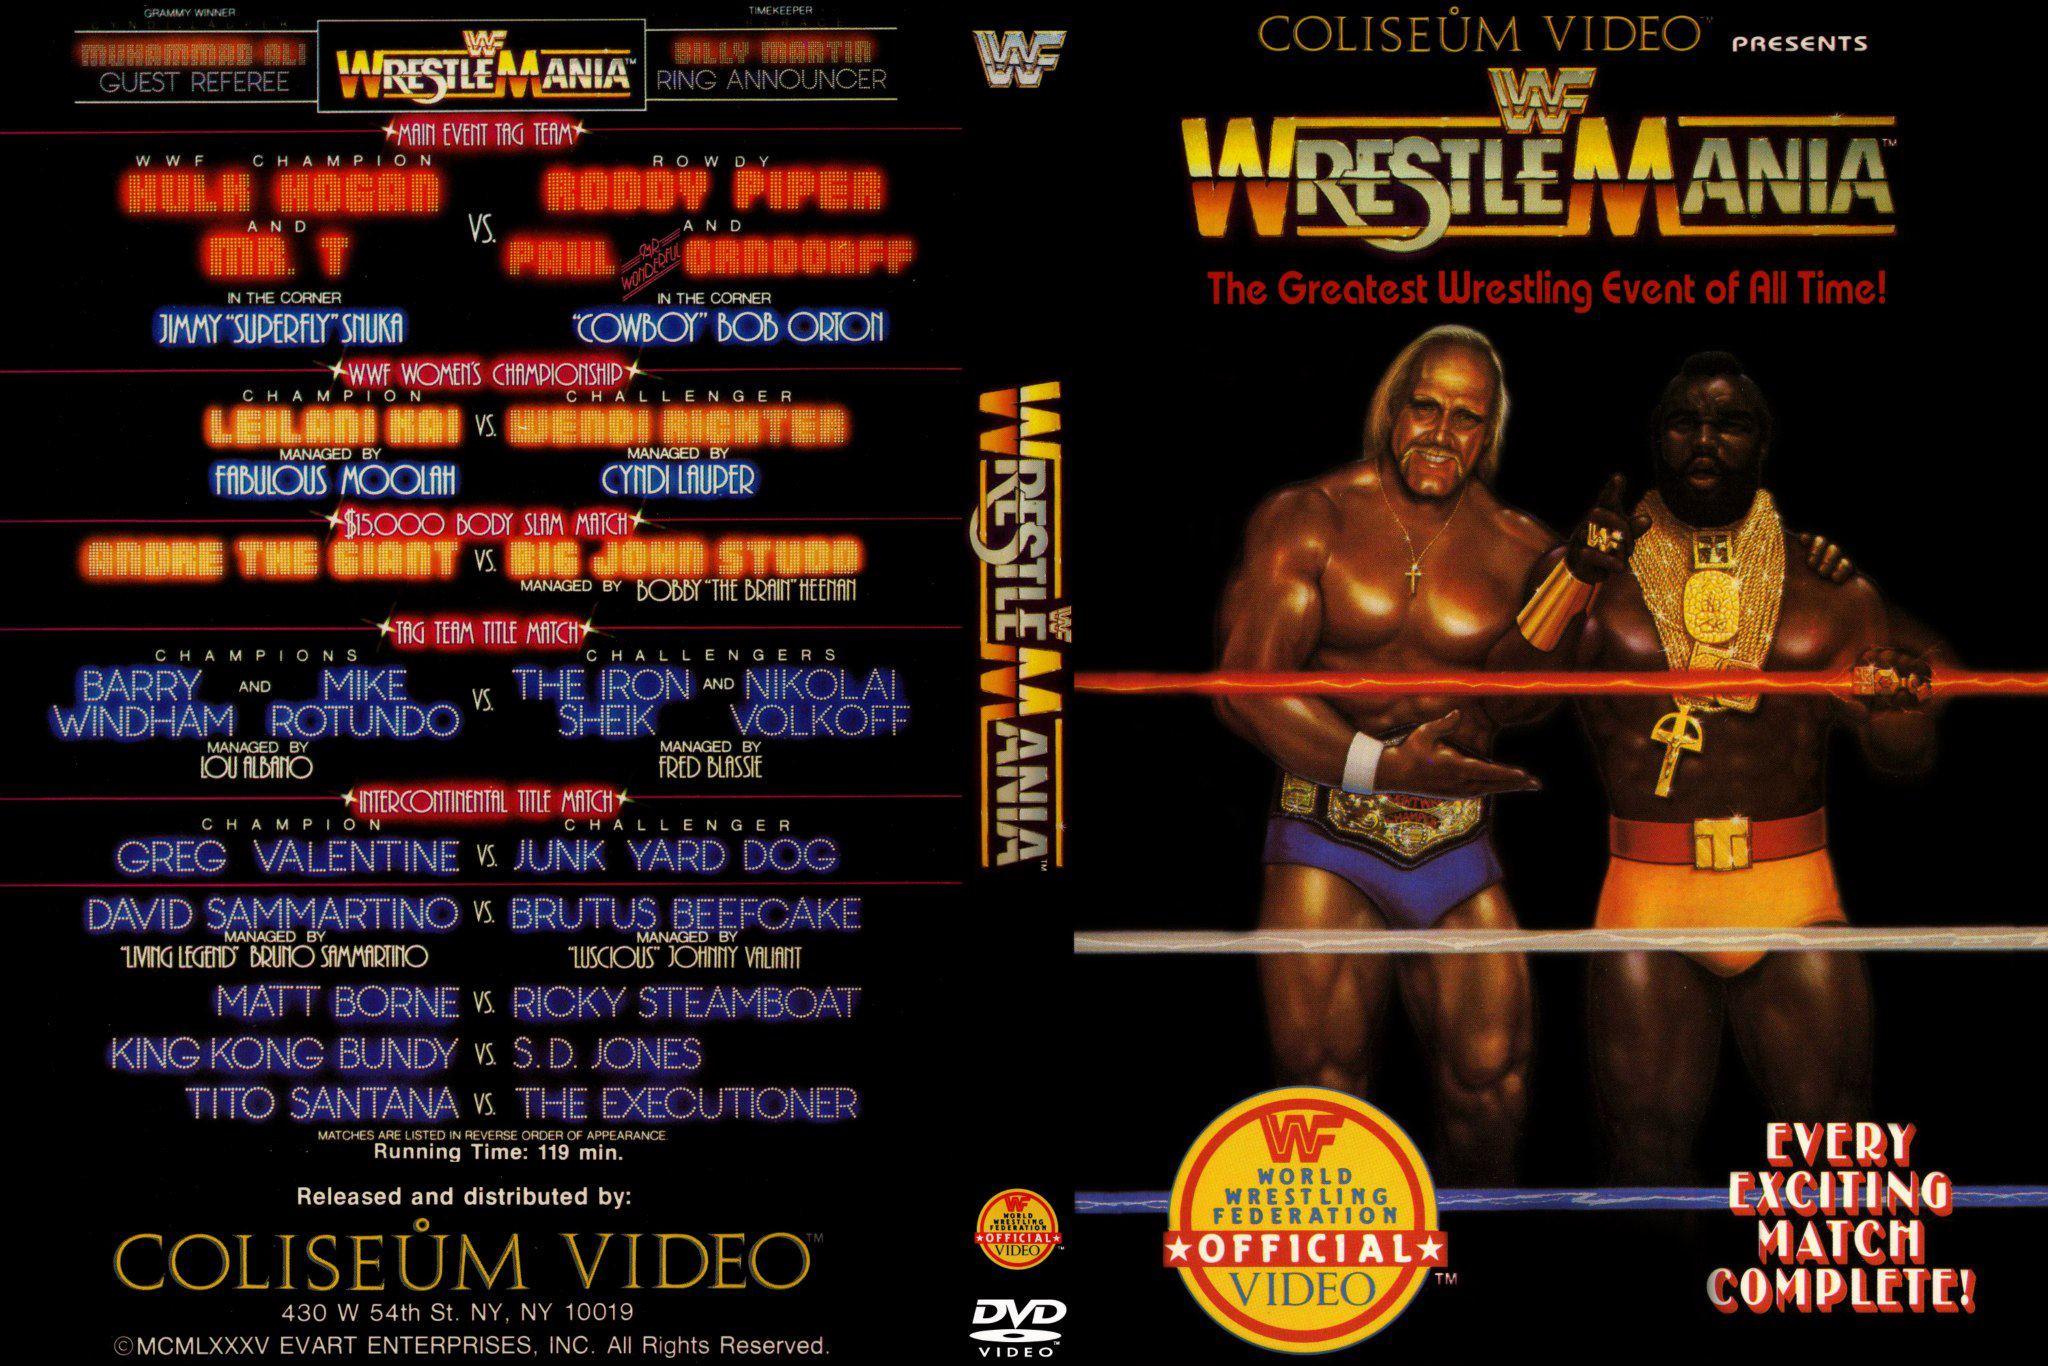 WWF WWE  WWF Old School